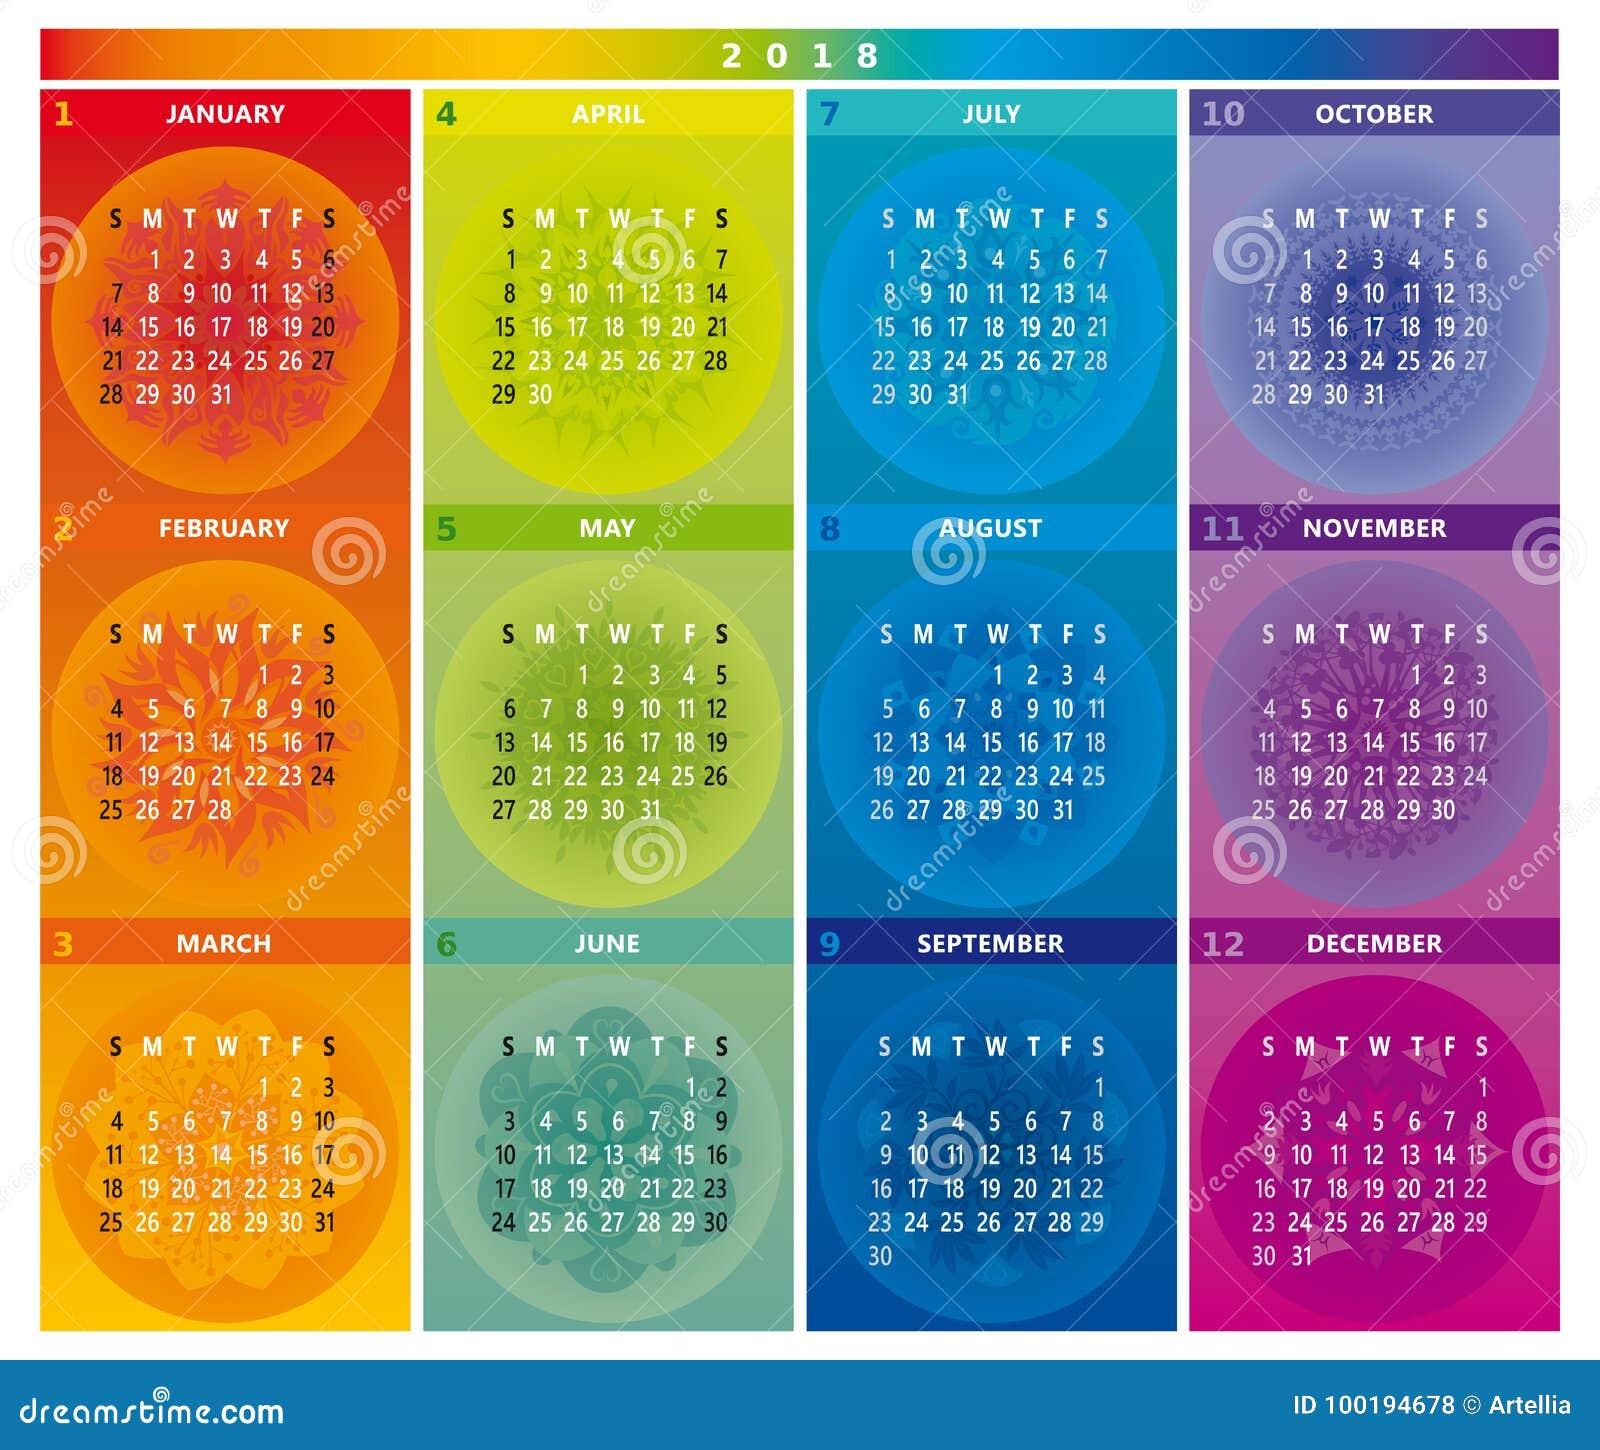 Calendario Rainbow.2018 Calendar With Mandalas In Rainbow Colors Stock Vector